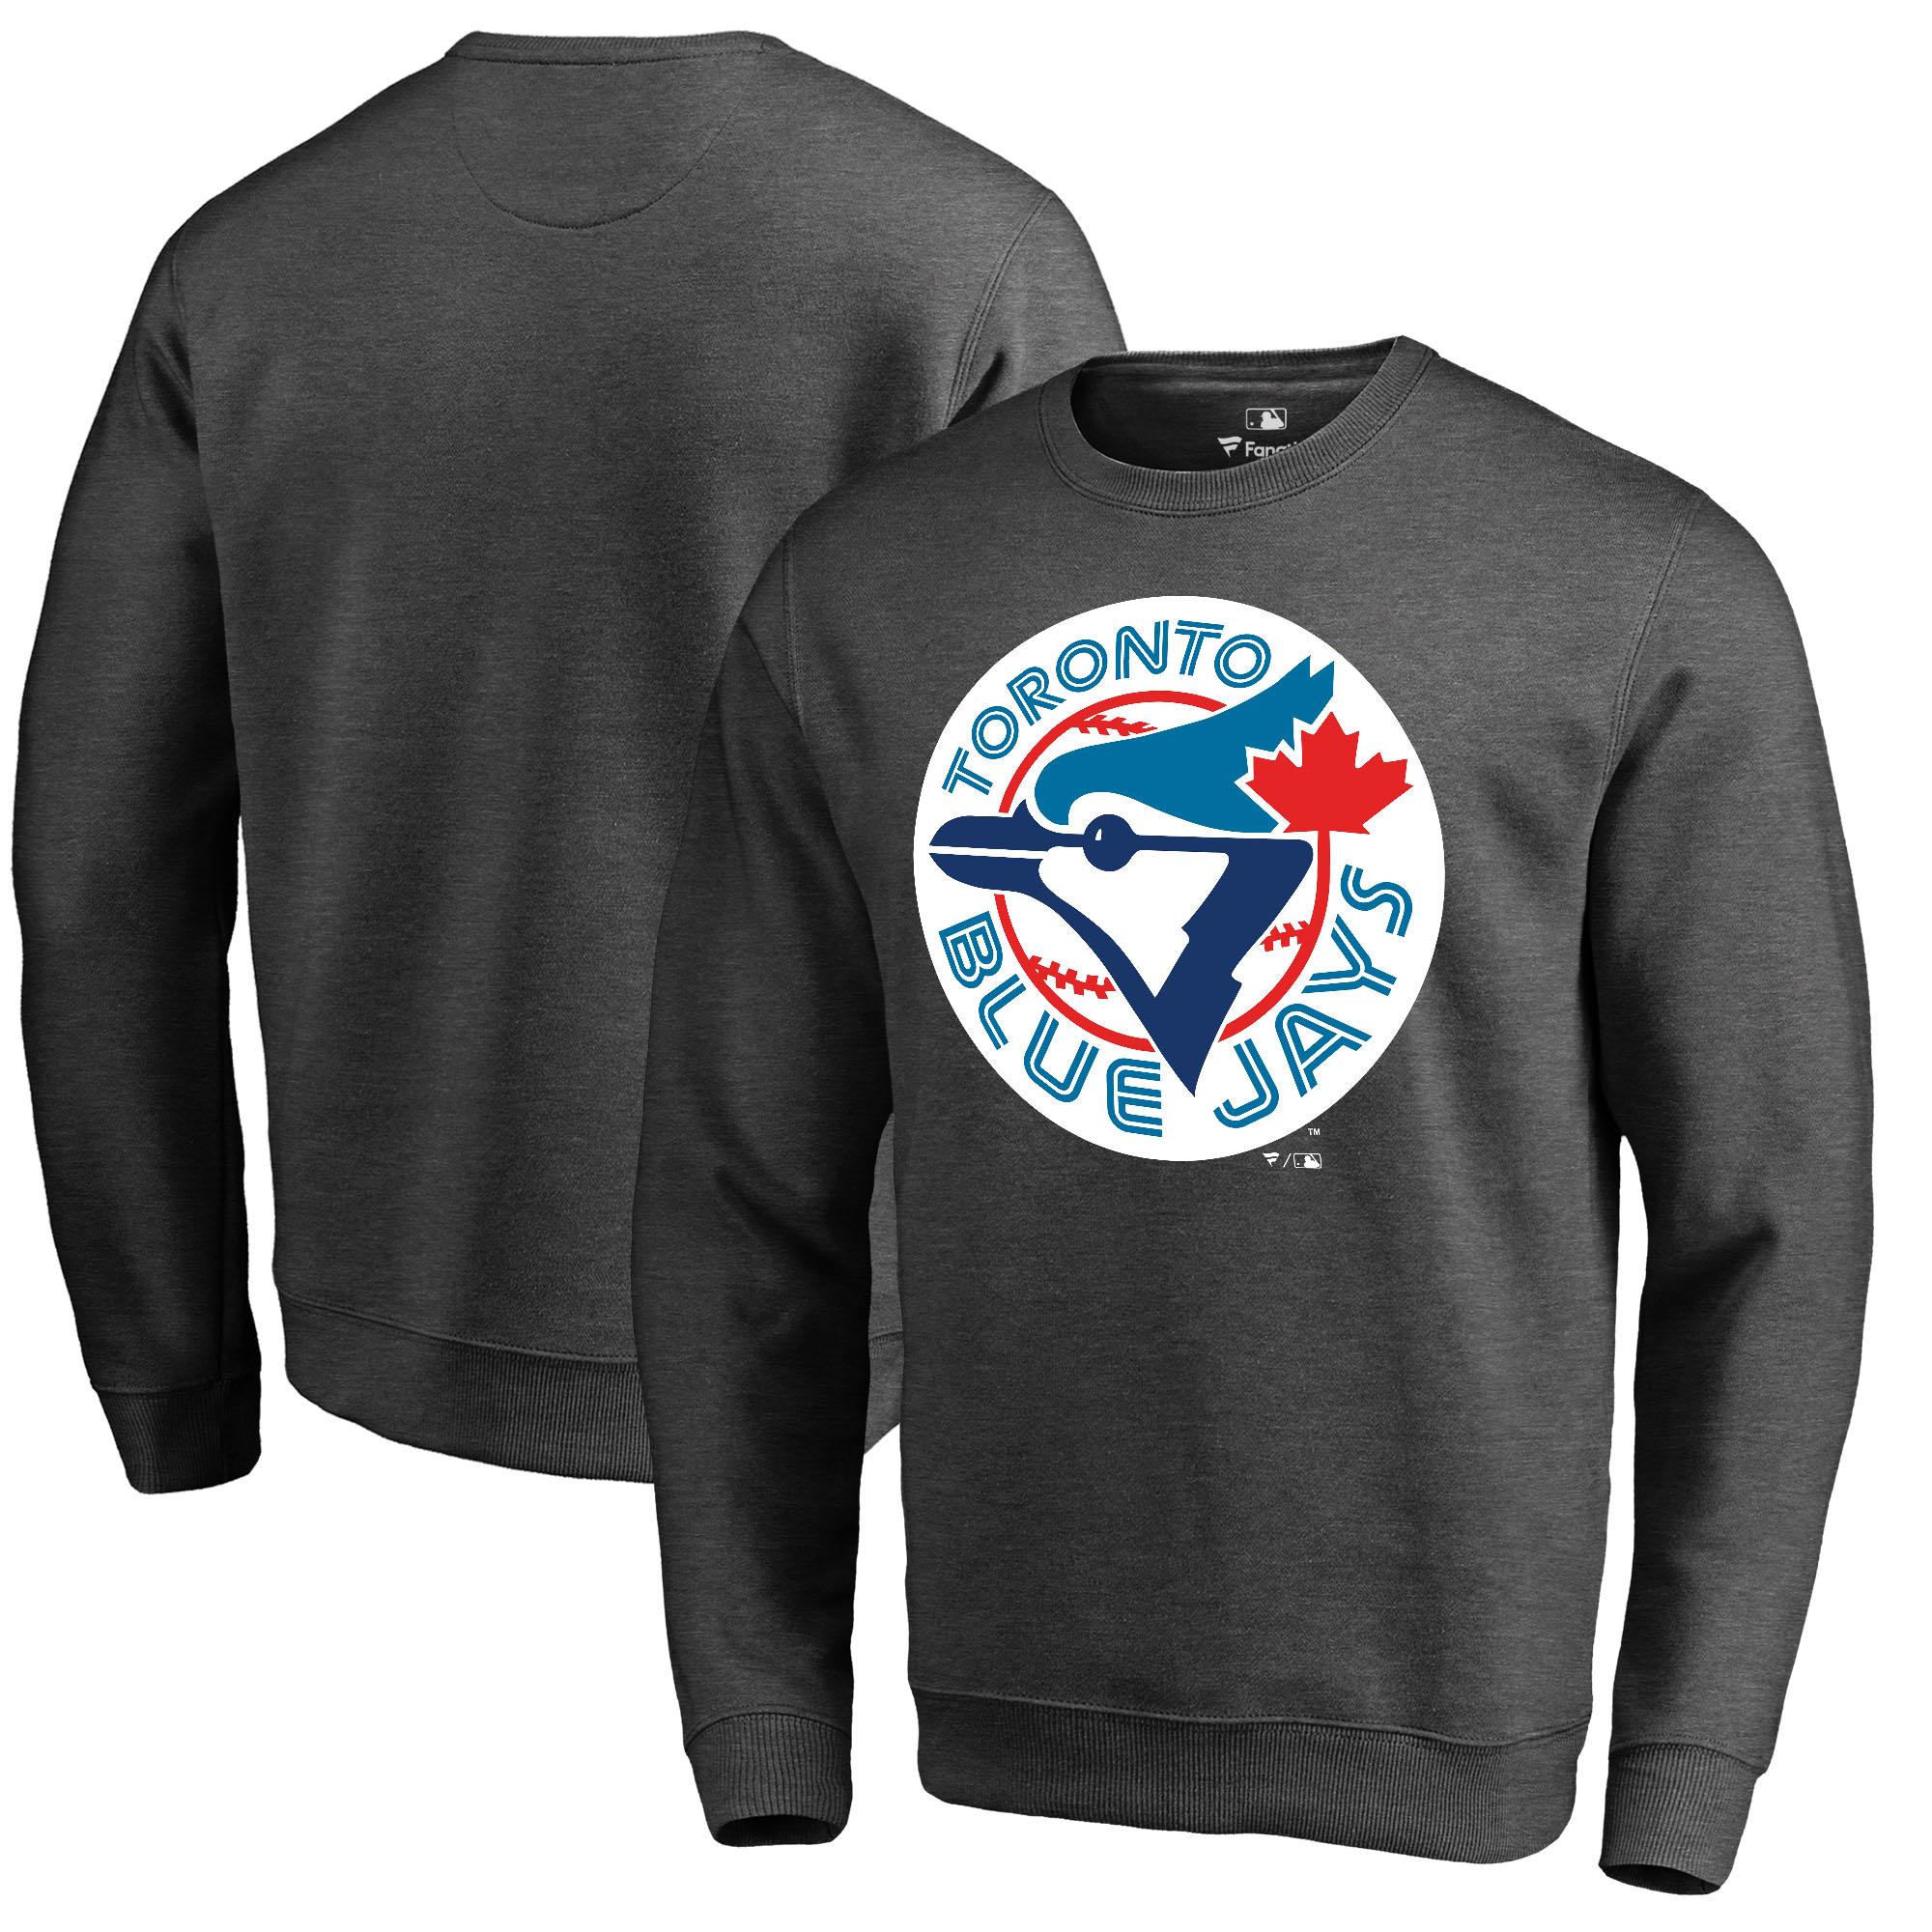 Toronto Blue Jays Fanatics Branded Cooperstown Collection Huntington Sweatshirt - Heathered Gray